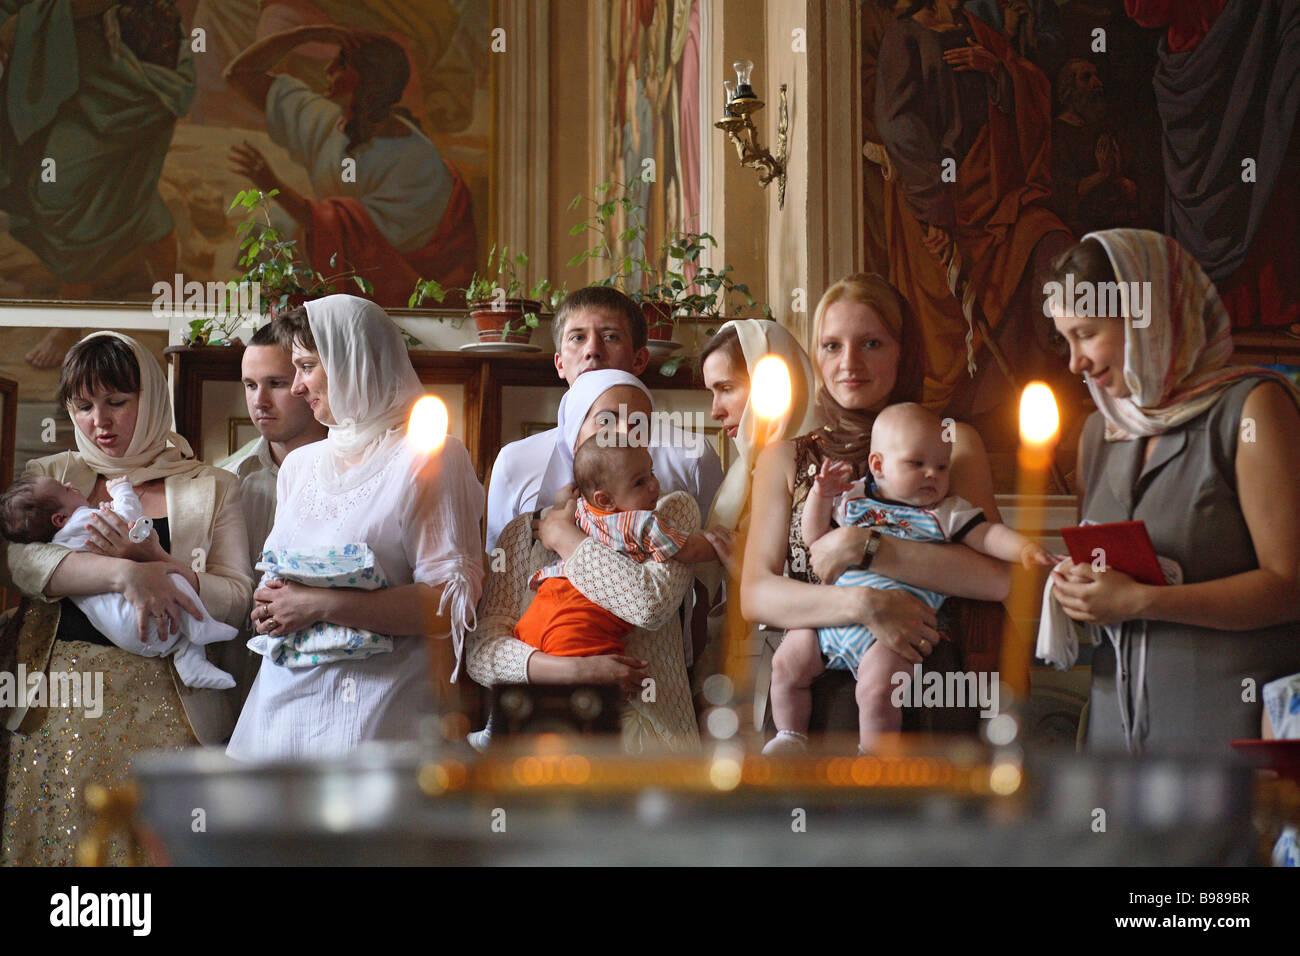 Baptizing infants in the St Daniil Monastery - Stock Image